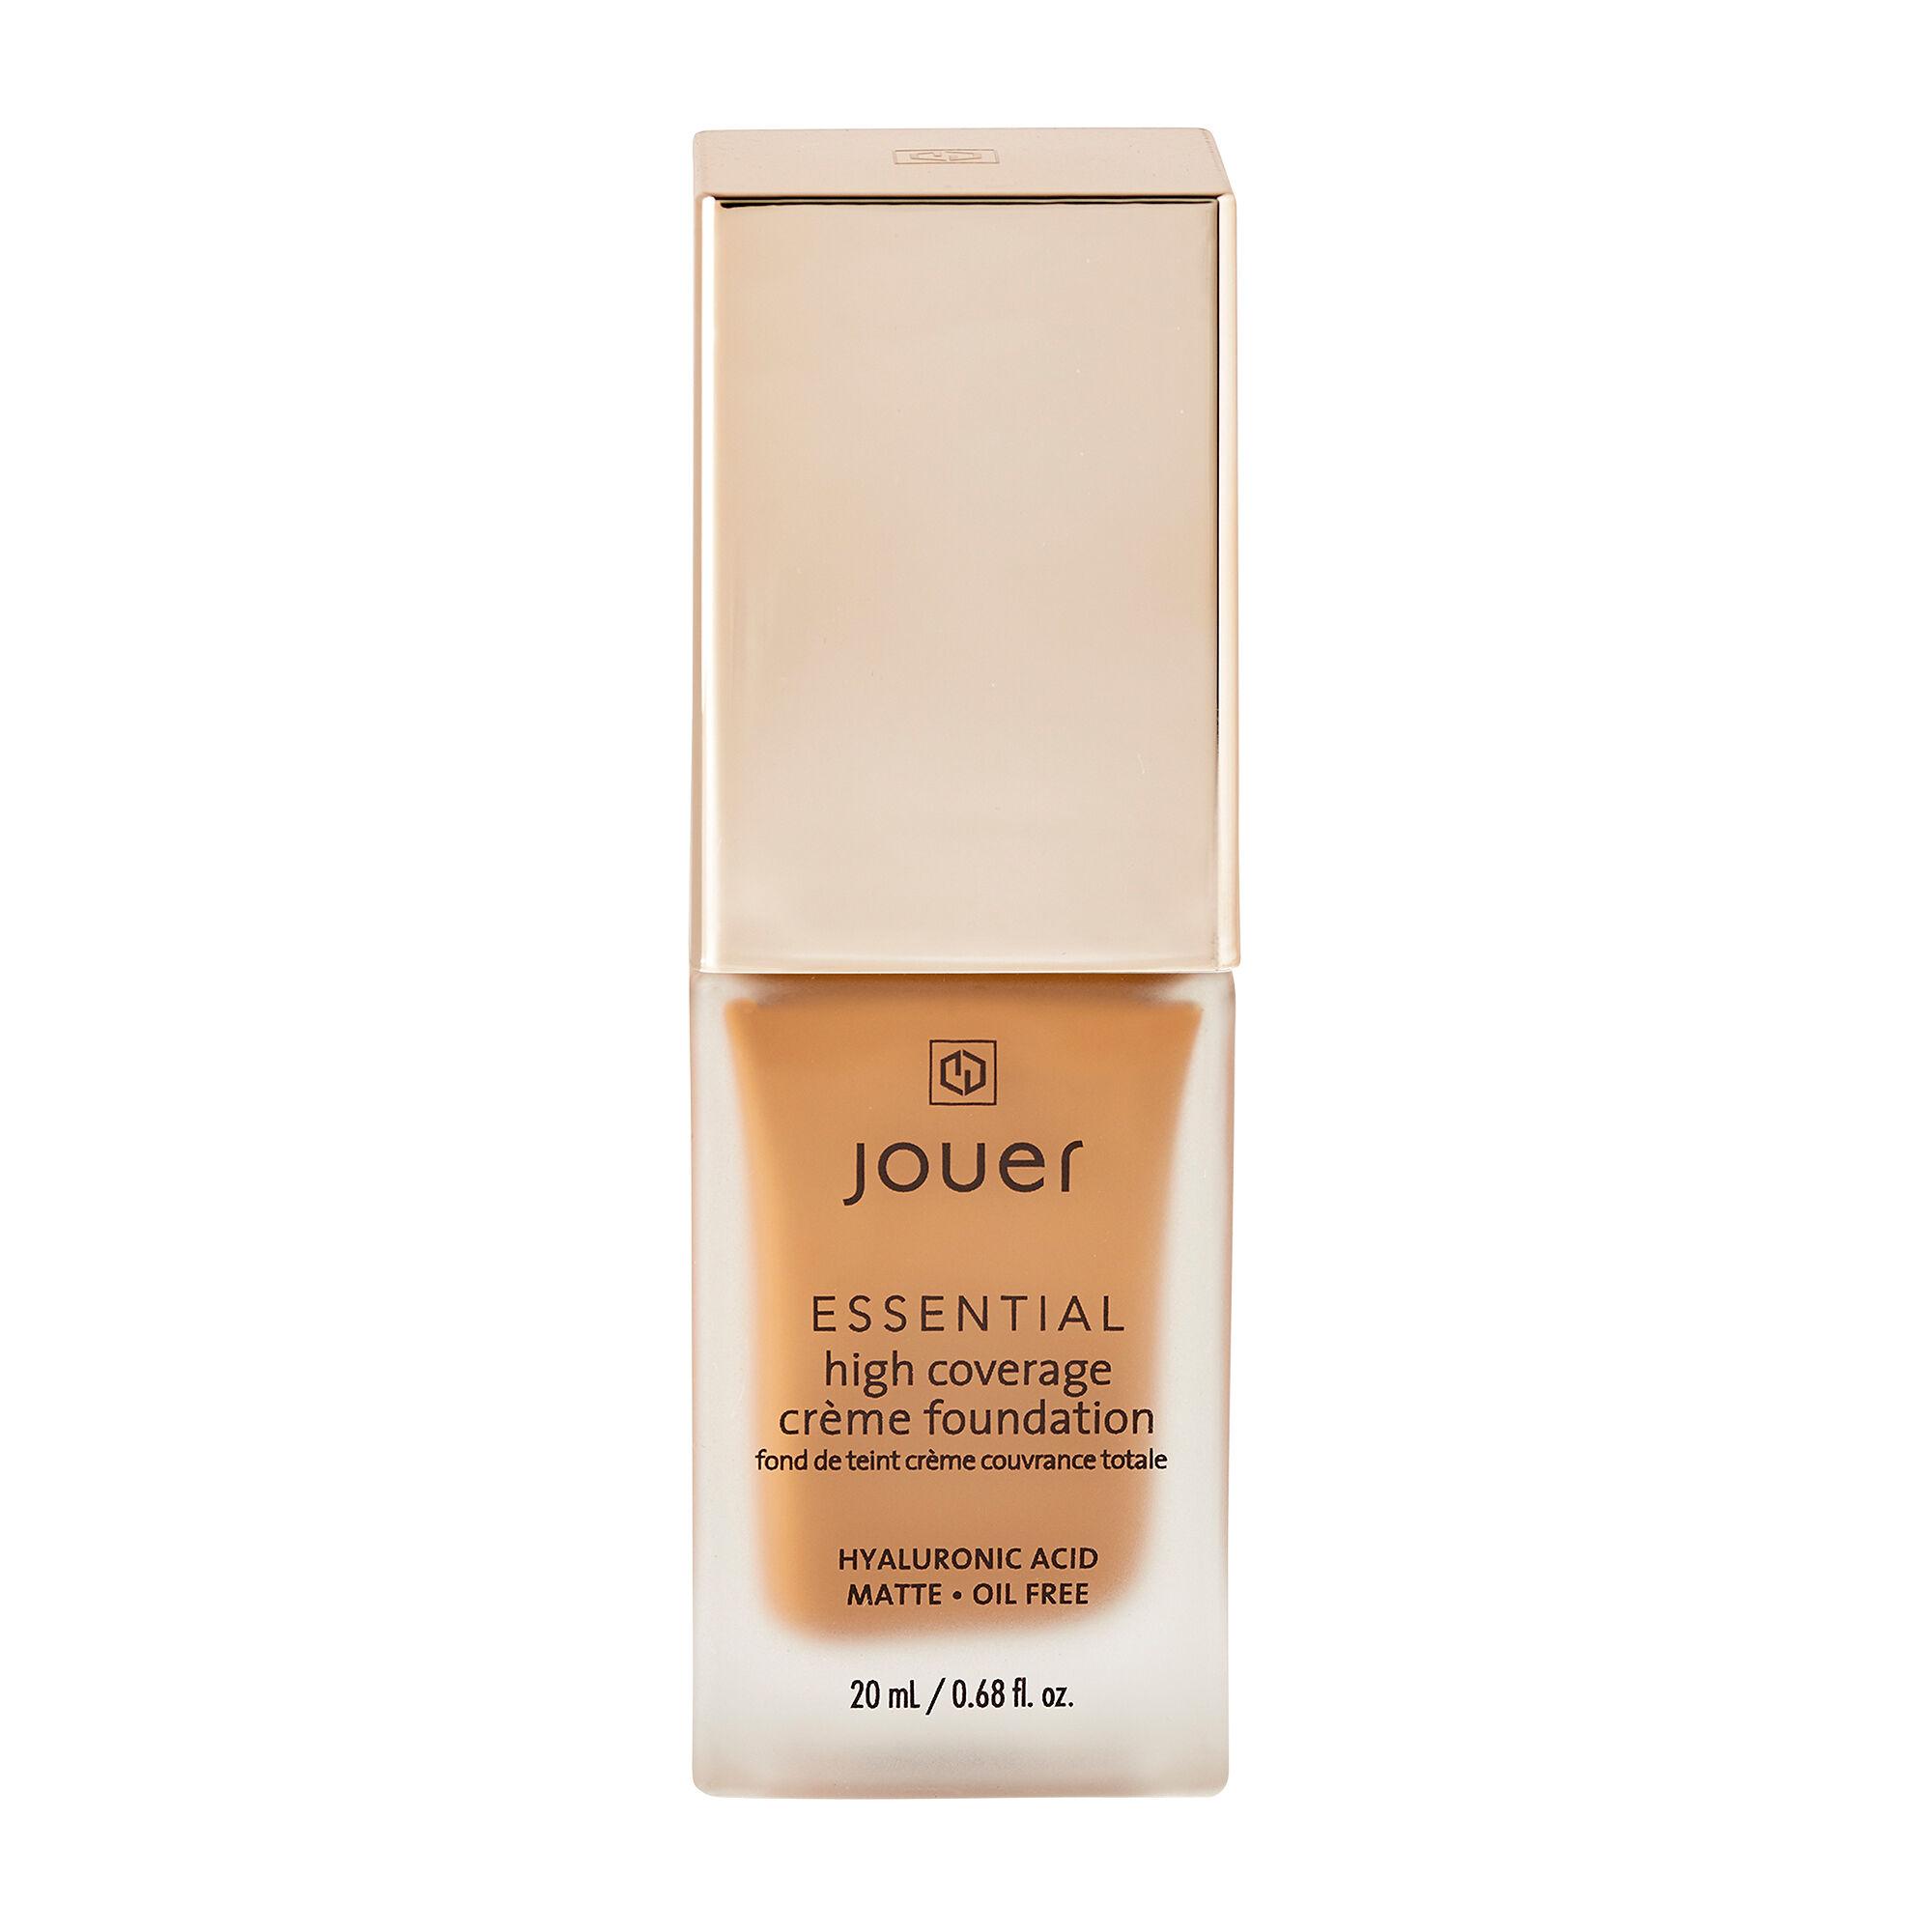 Jouer Cosmetics Essential High Coverage Creme Foundation Cocoa 20ml